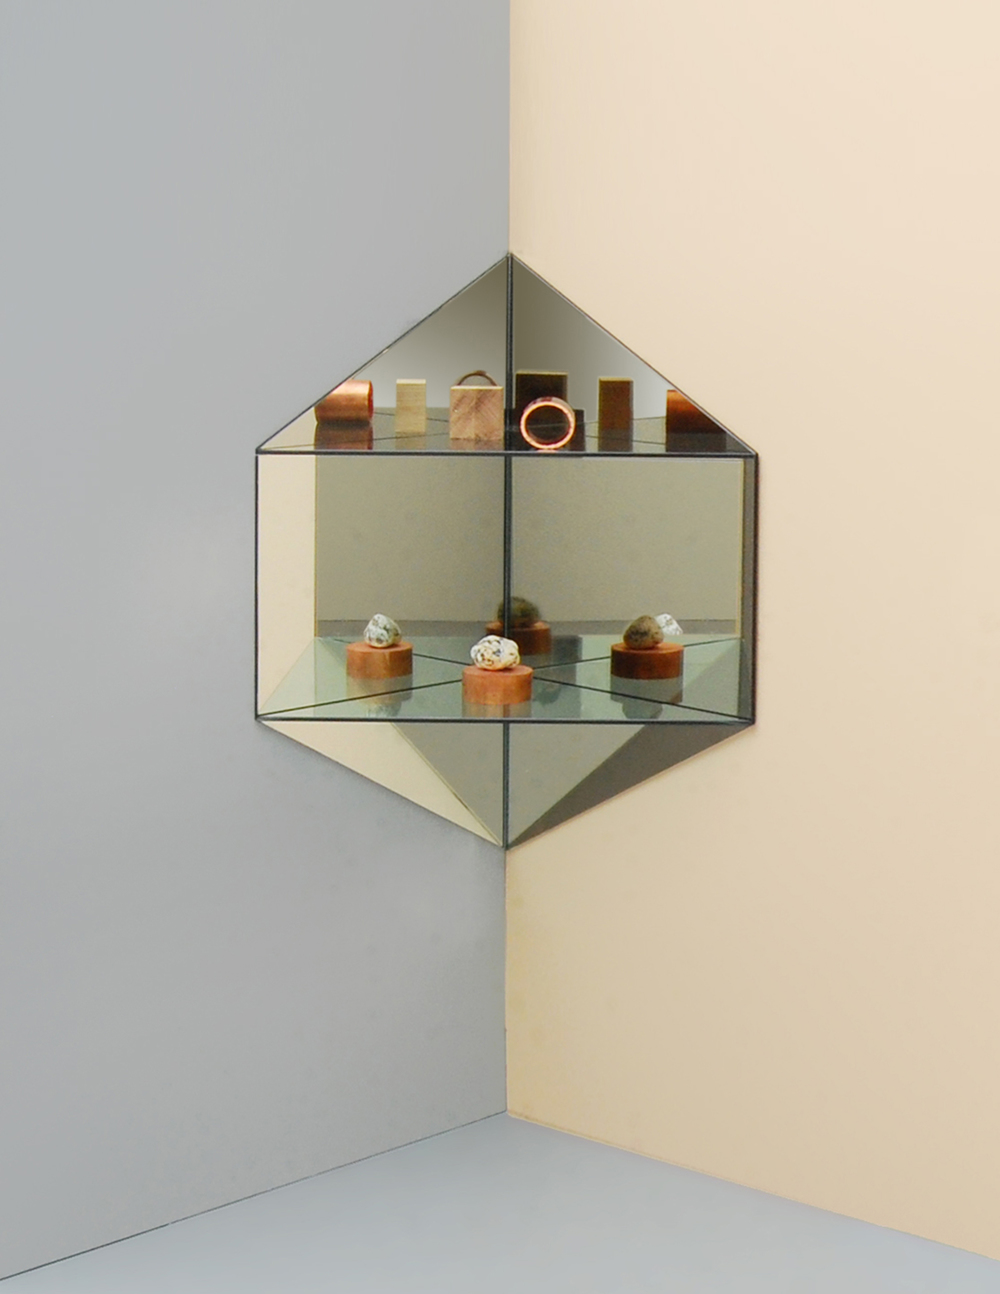 LG Studio_Mirage_Shelf_hexagon2.jpg